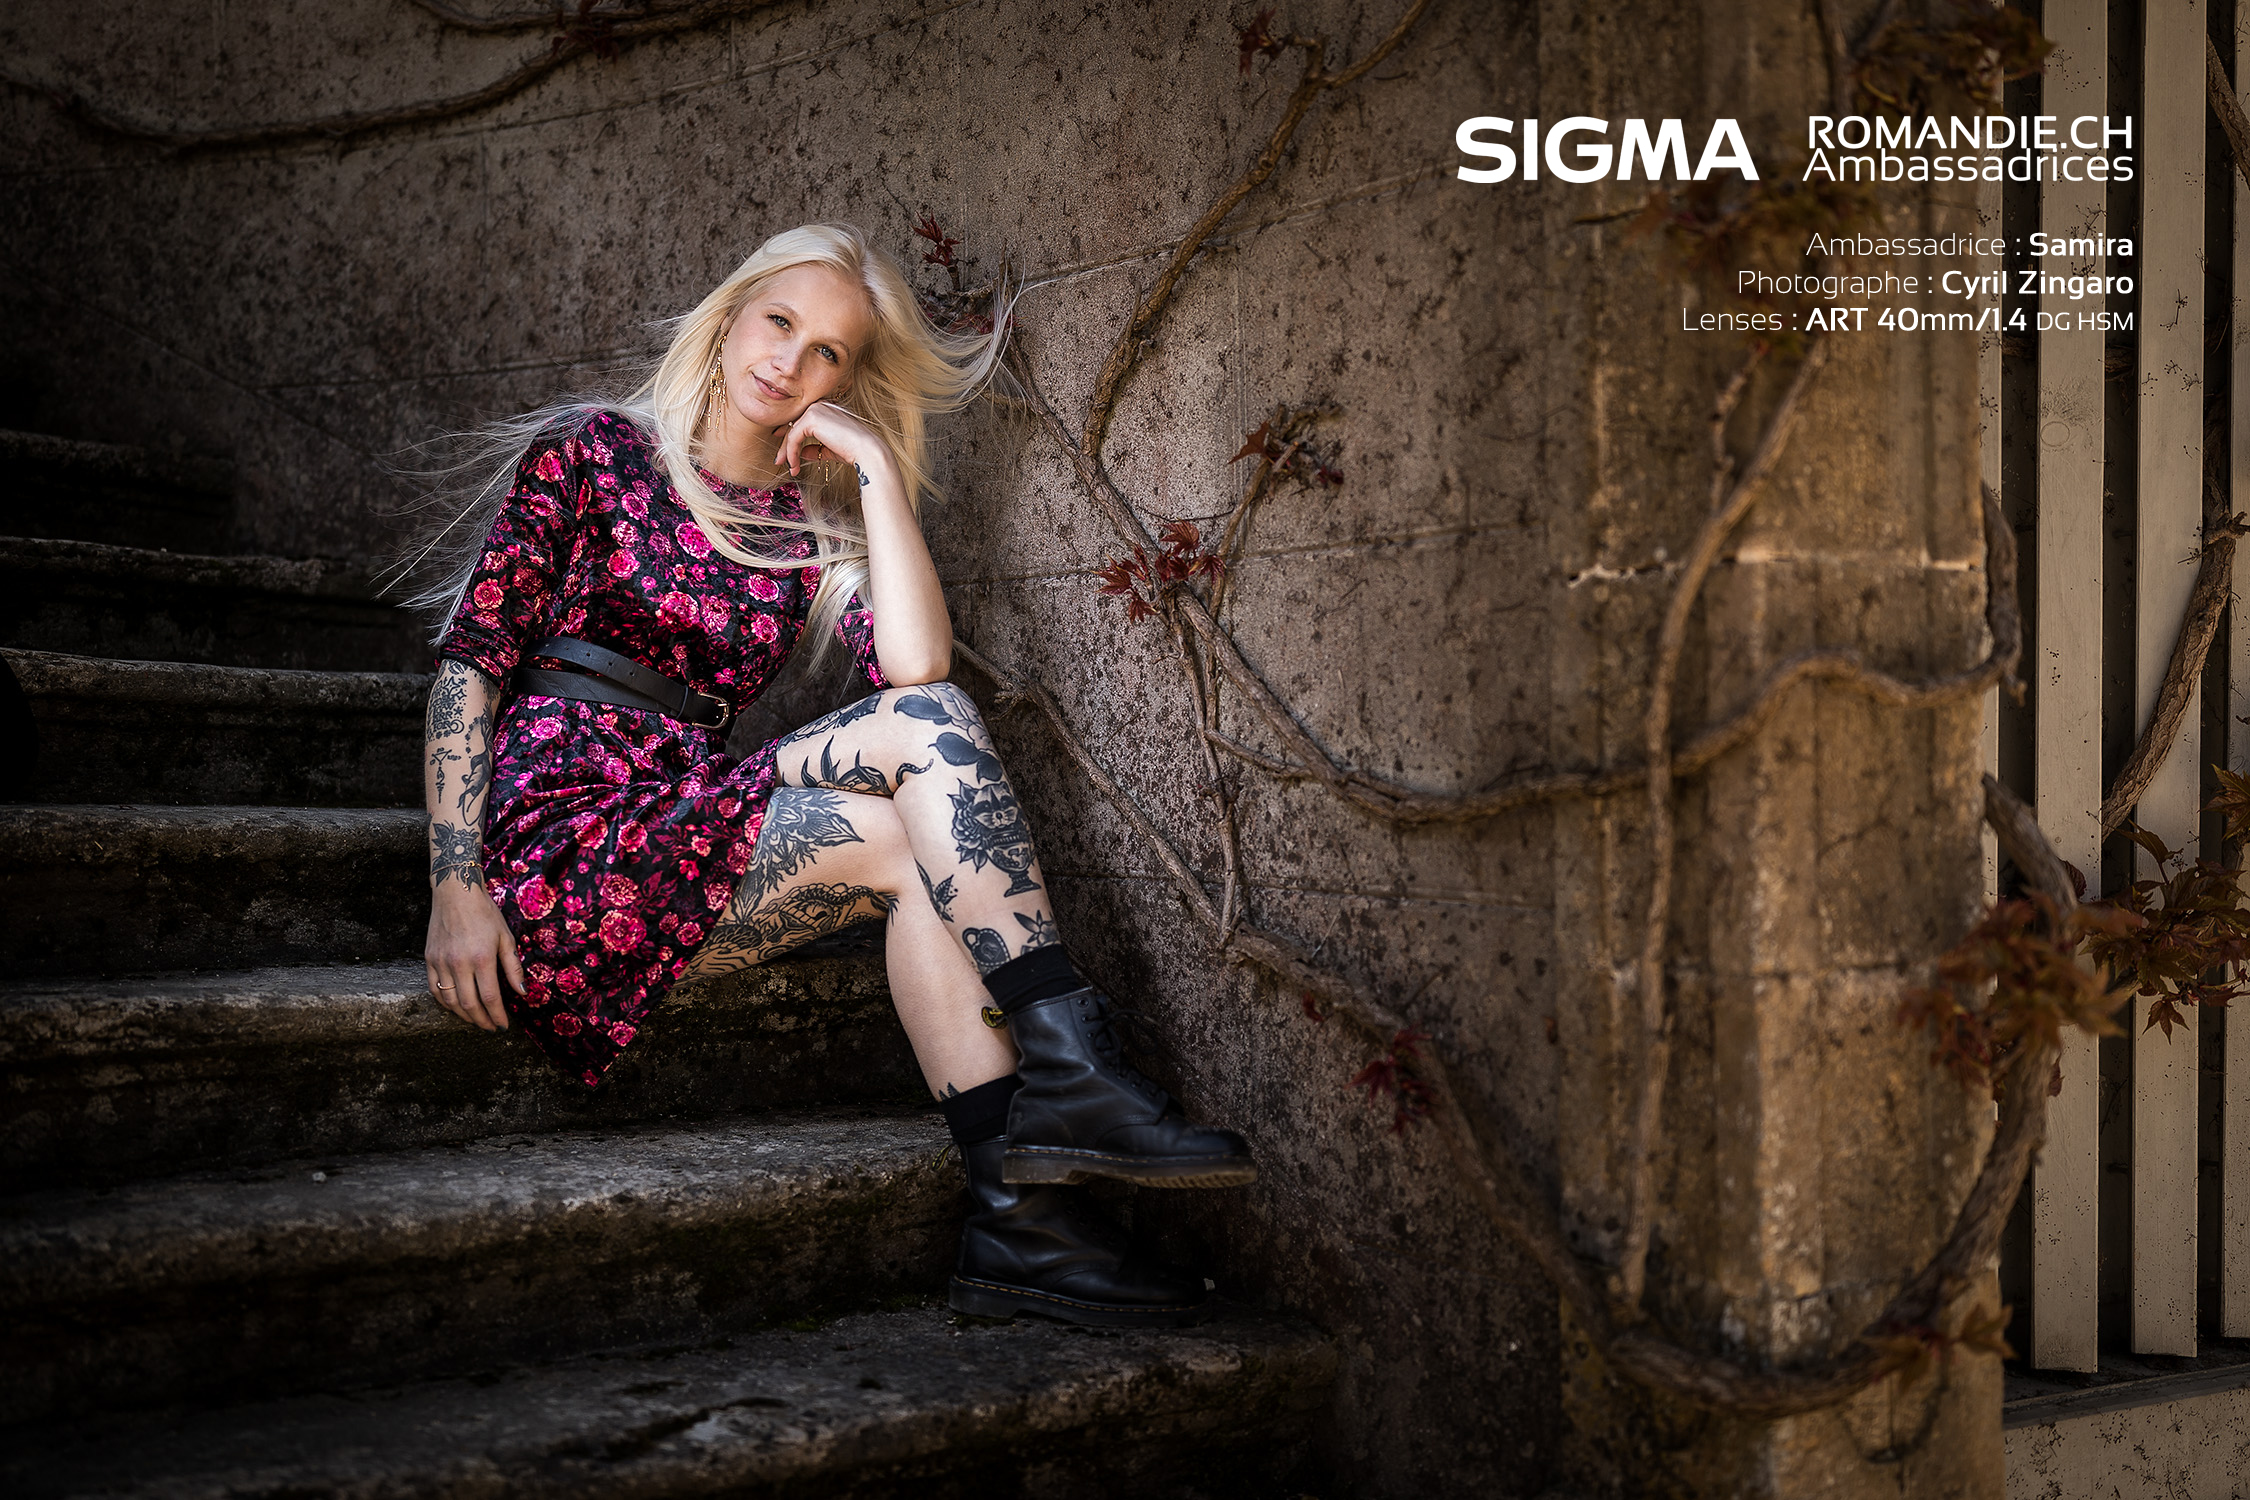 sigma_ambassadrice_2019_24HD